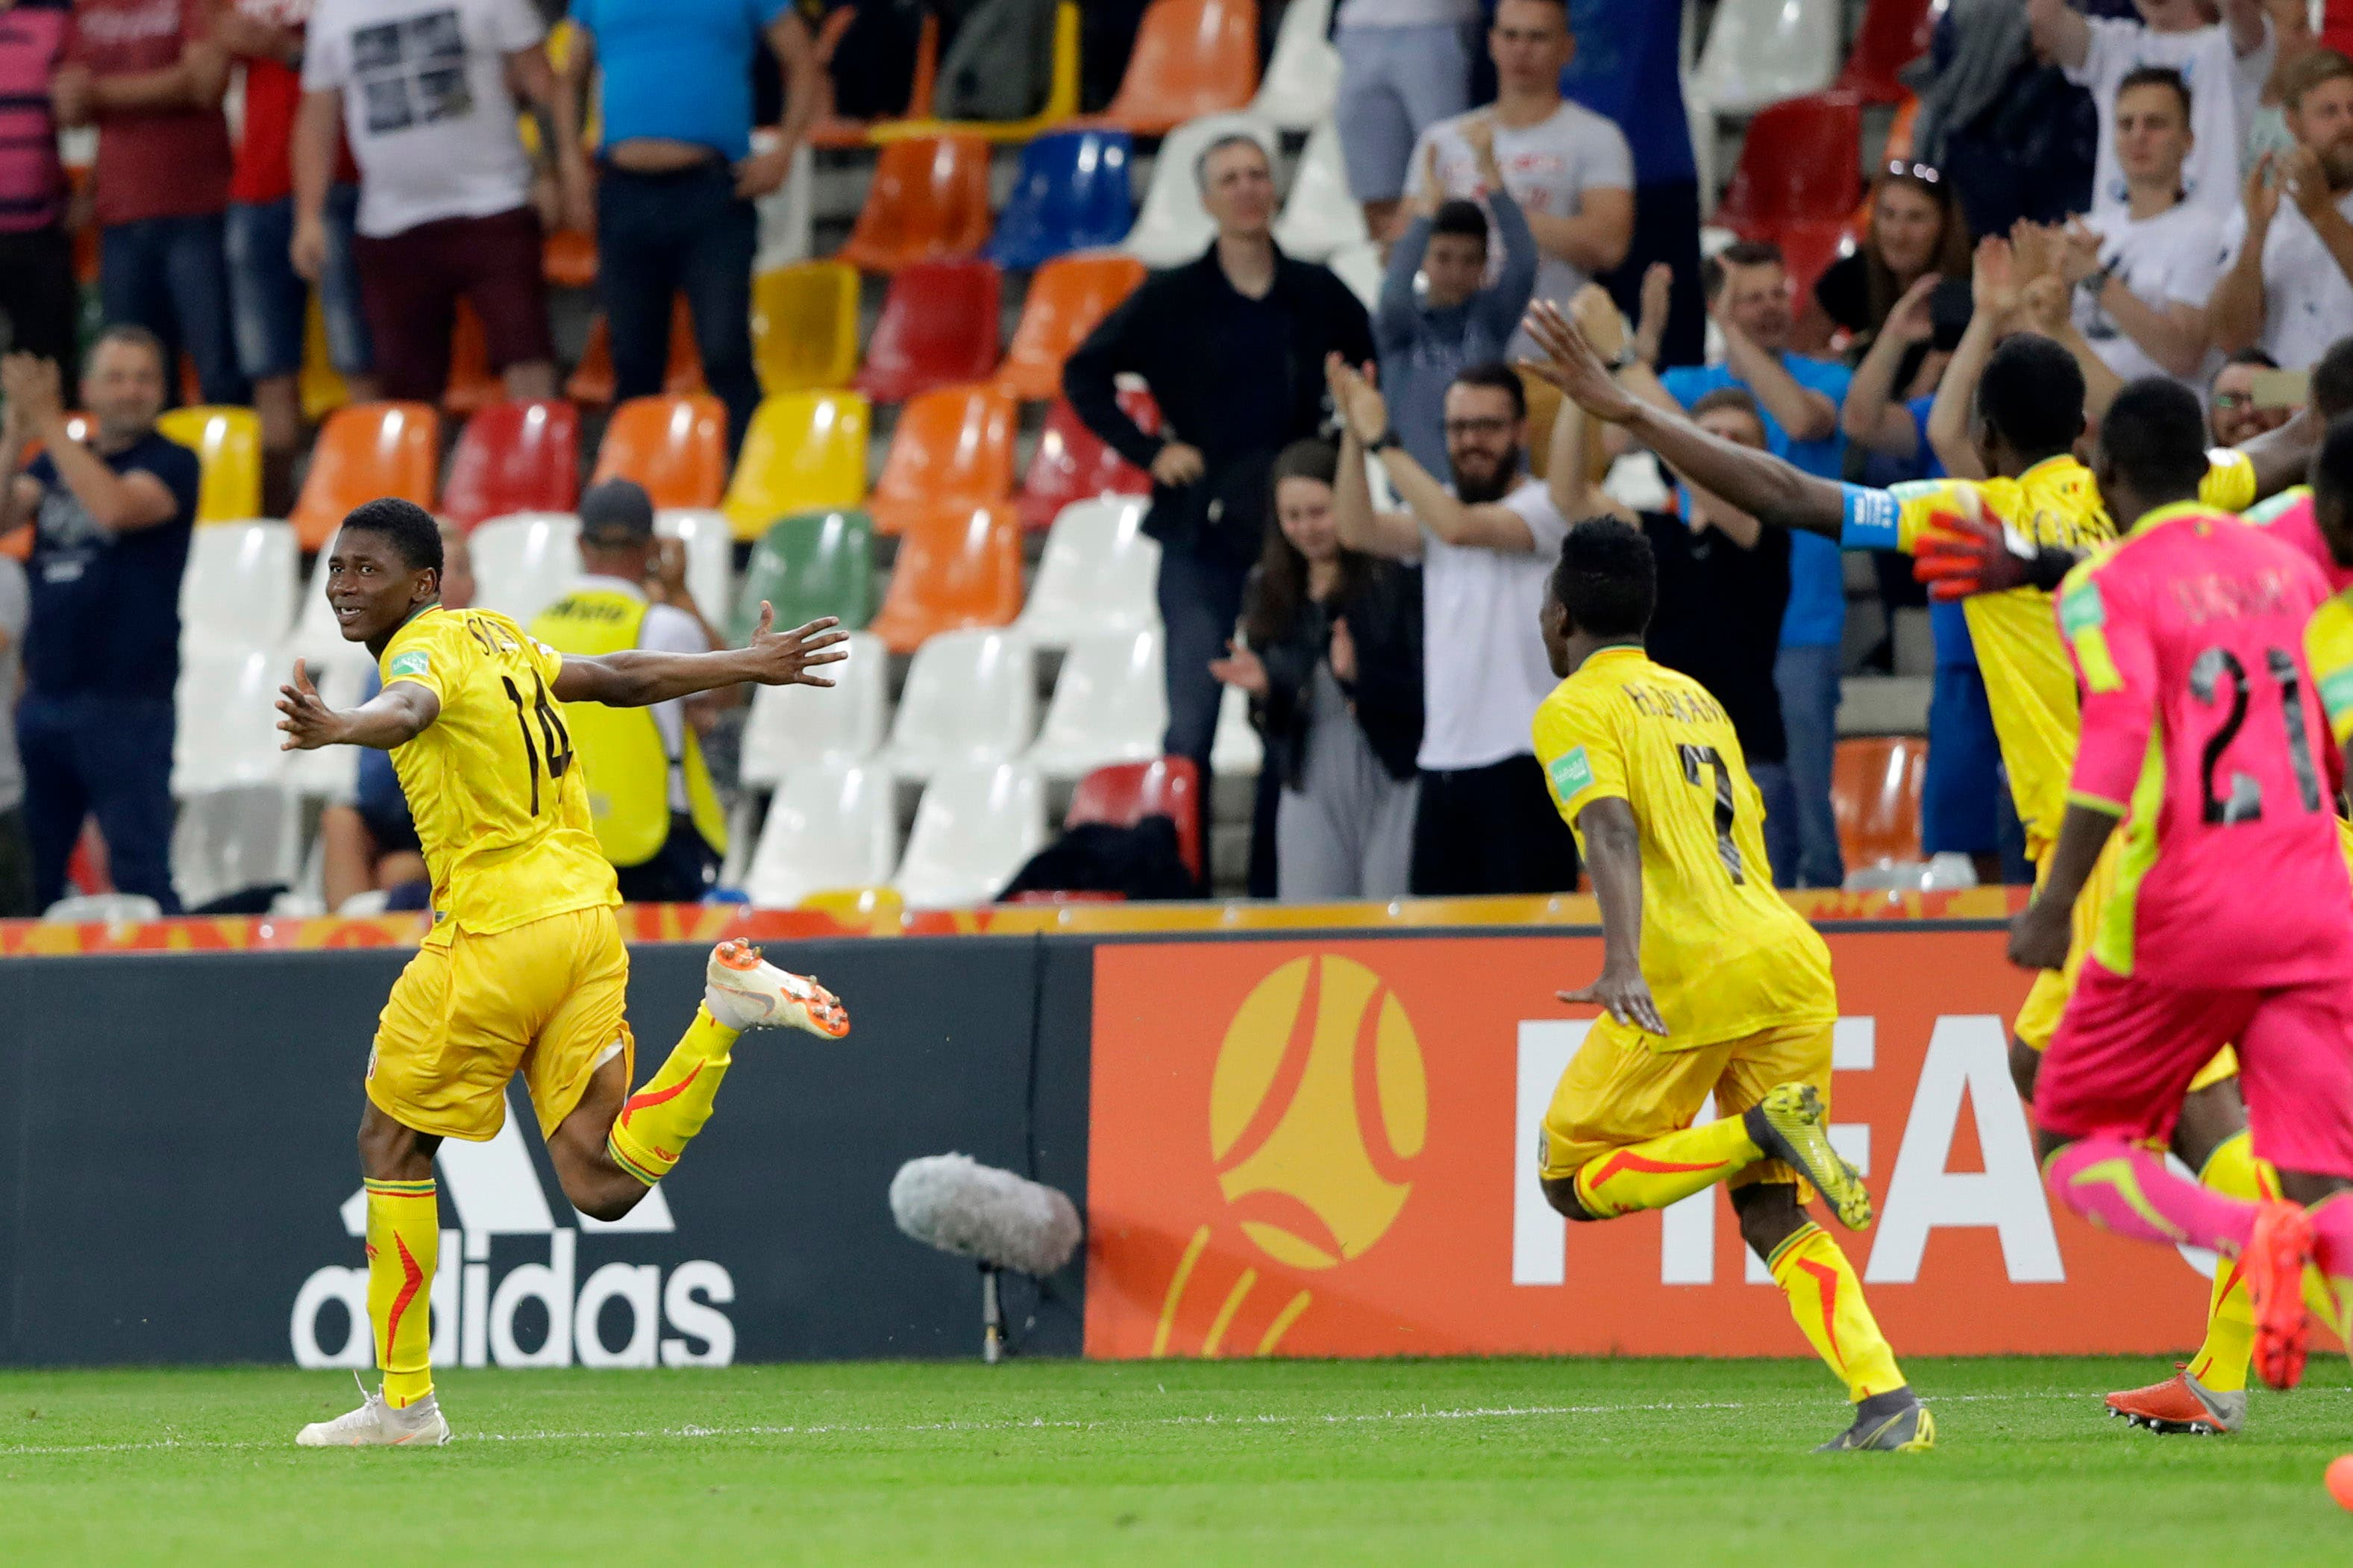 El gol maldito sobre el final del partido y el penal que eliminó a la Argentina del Mundial Sub 20